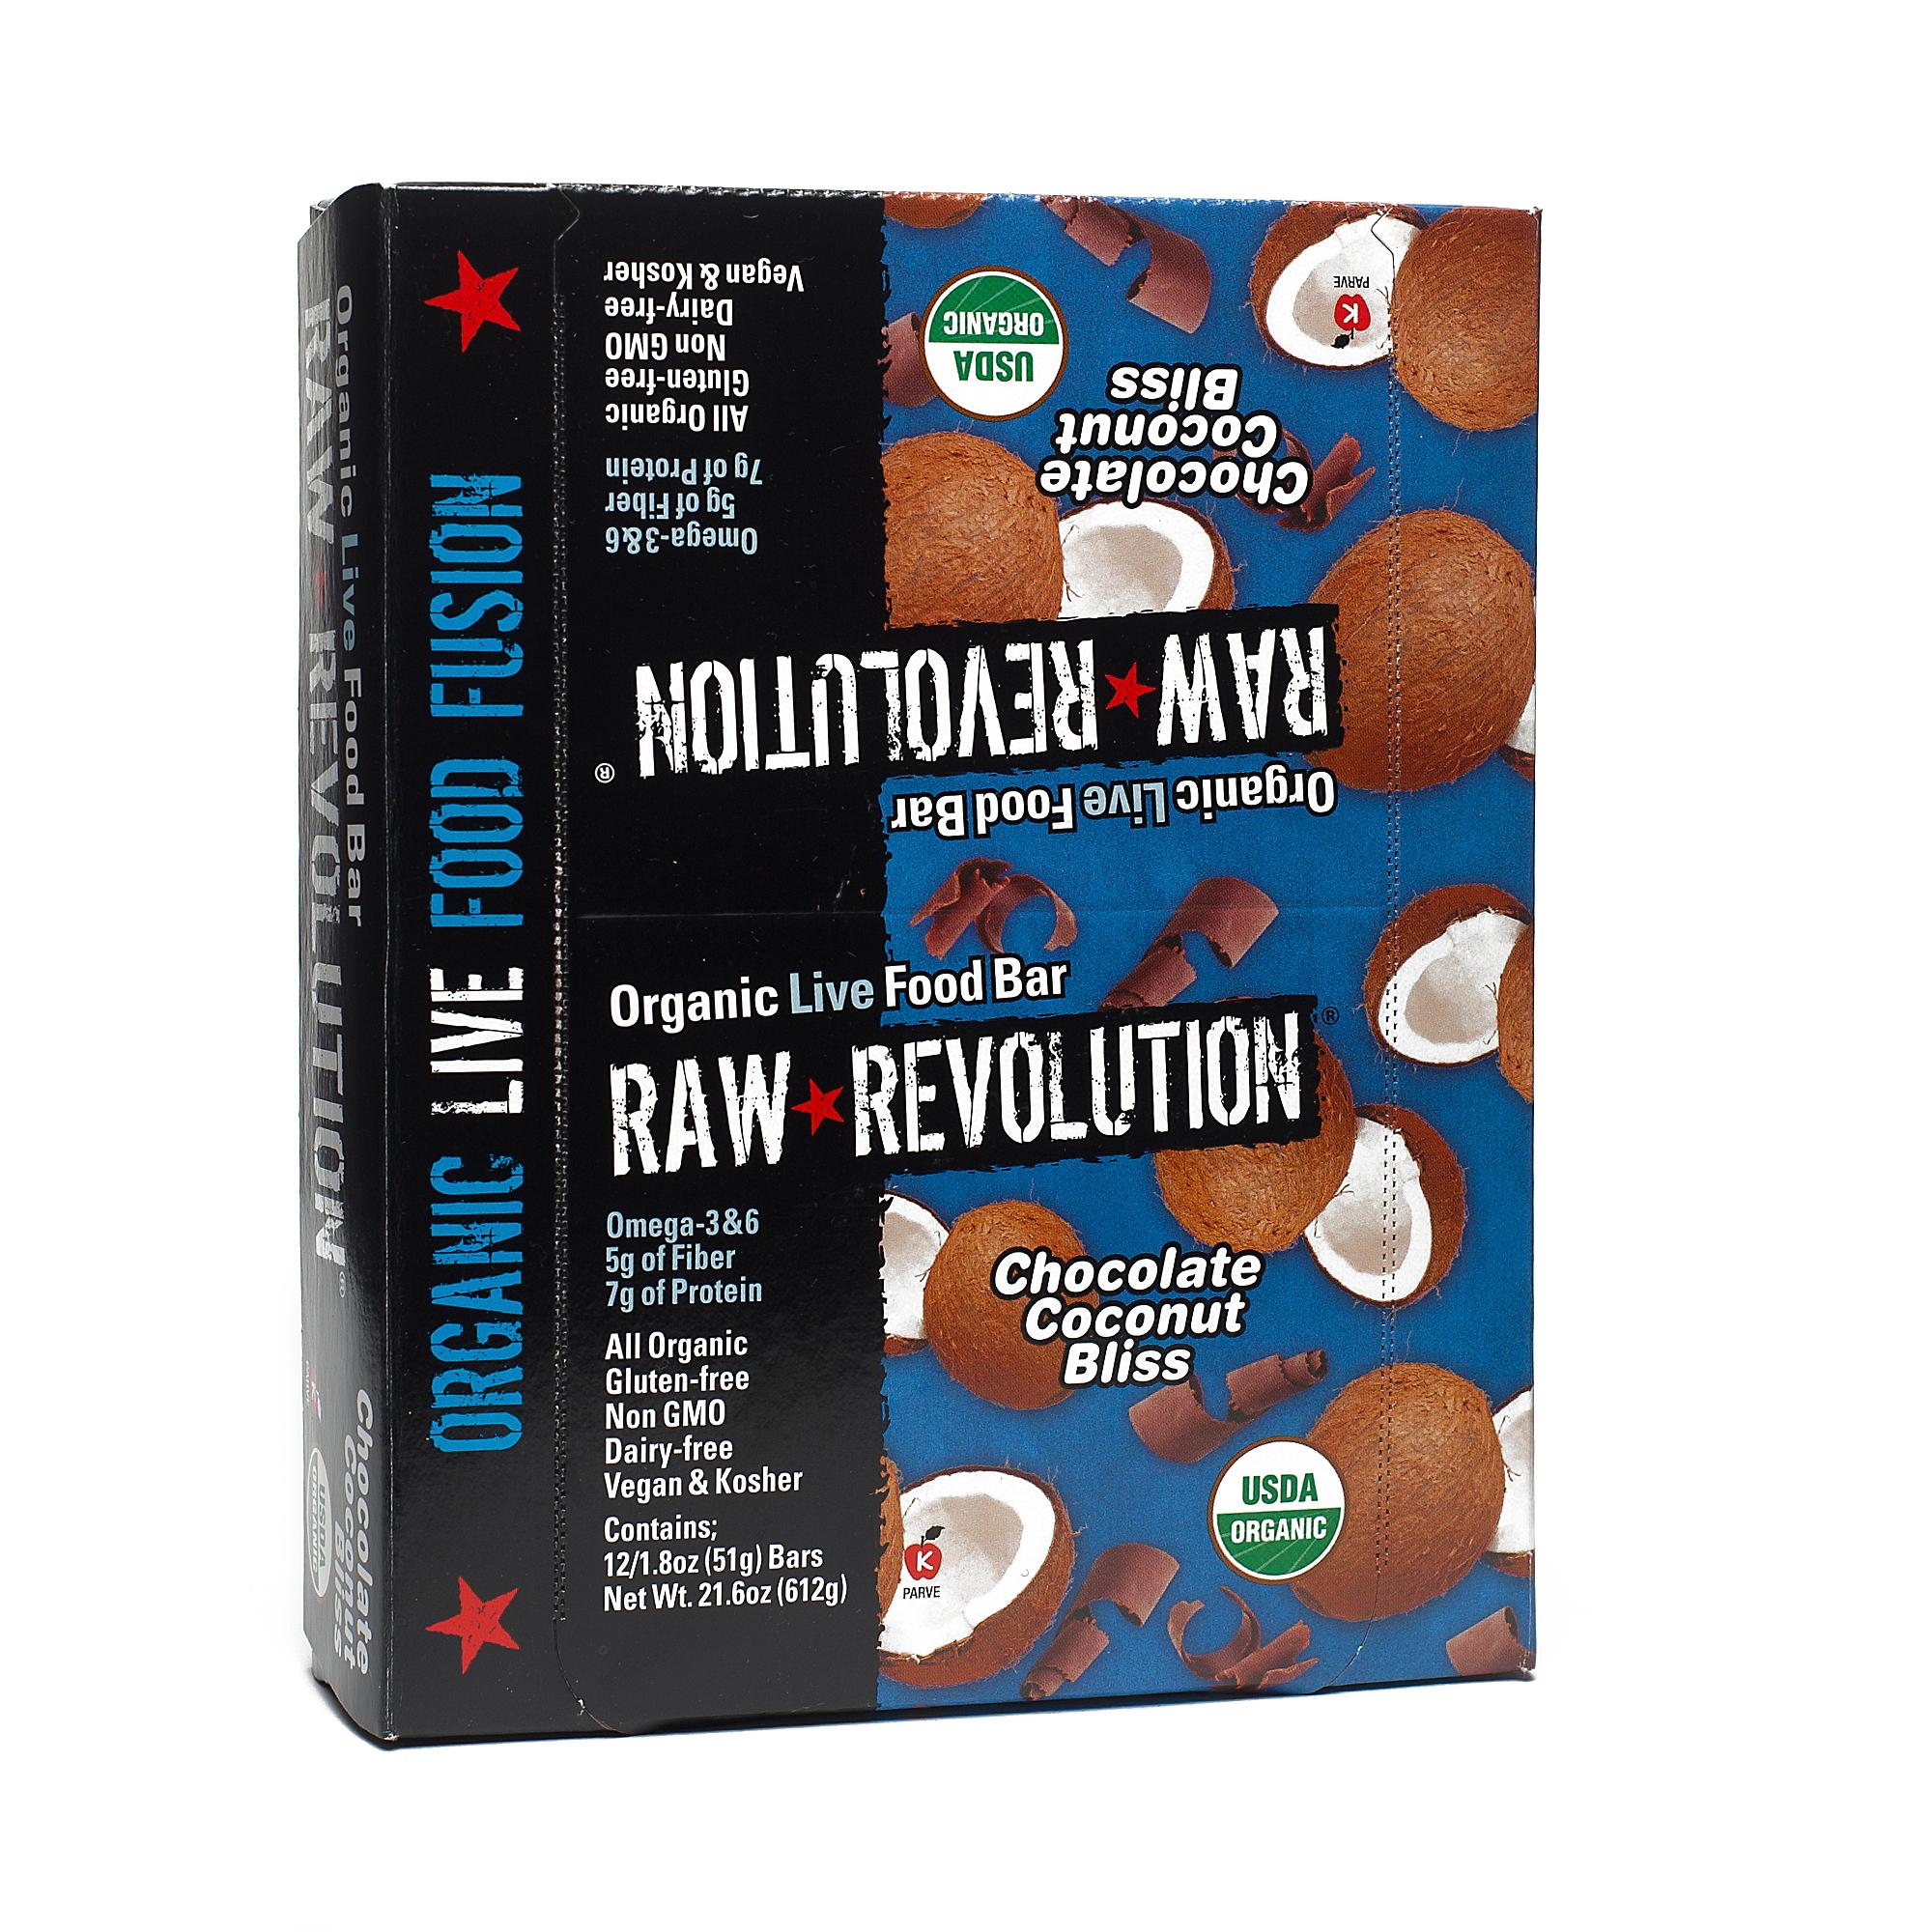 Raw Revolution Chocolate Coconut Bliss